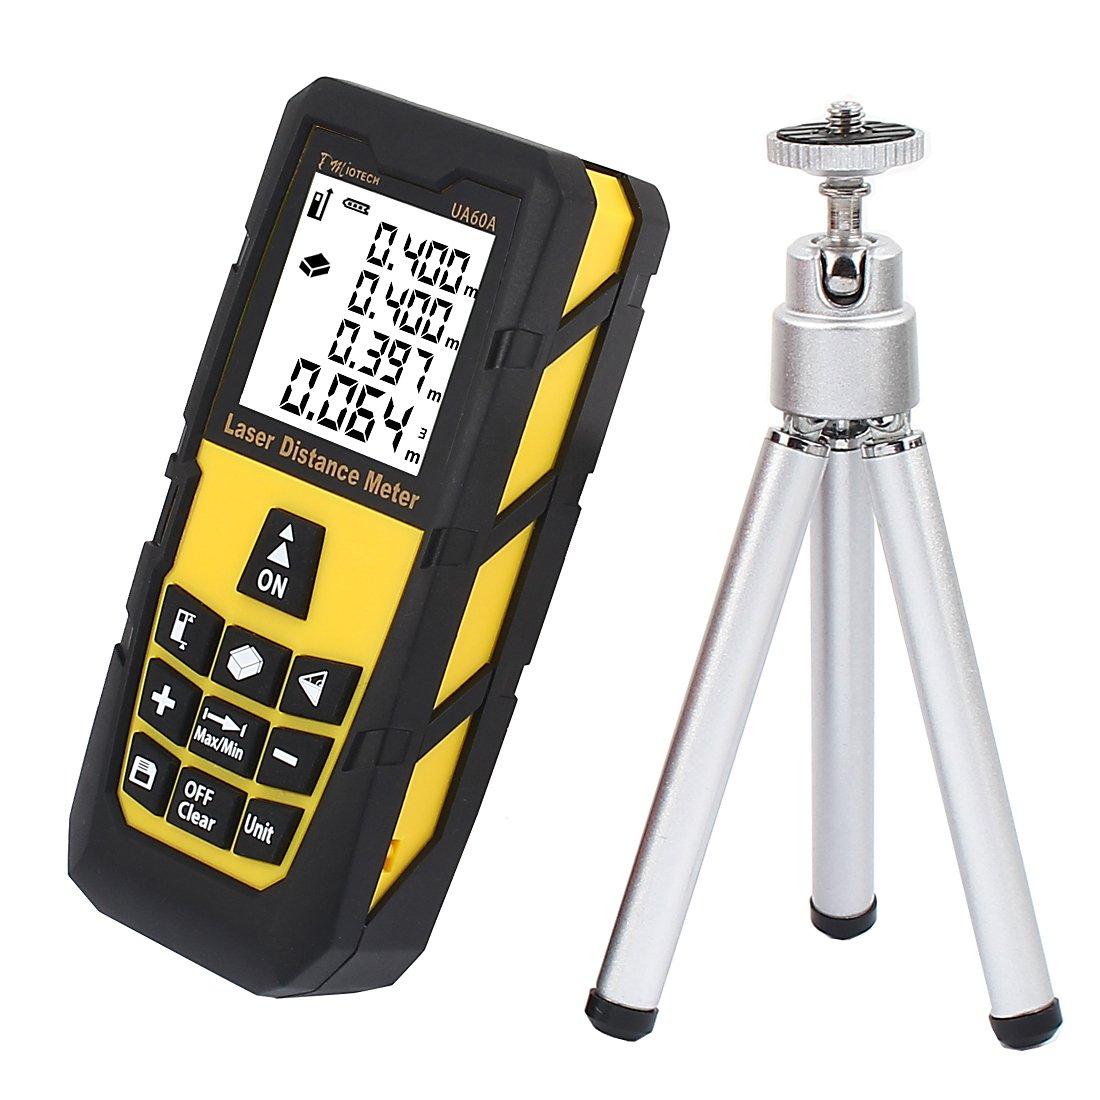 DMiotech Laser Distance Measure 196ft 60m Mini Handheld Digital Laser Distance Meter Rangefinder Measurer Tape Yellow with Tripod